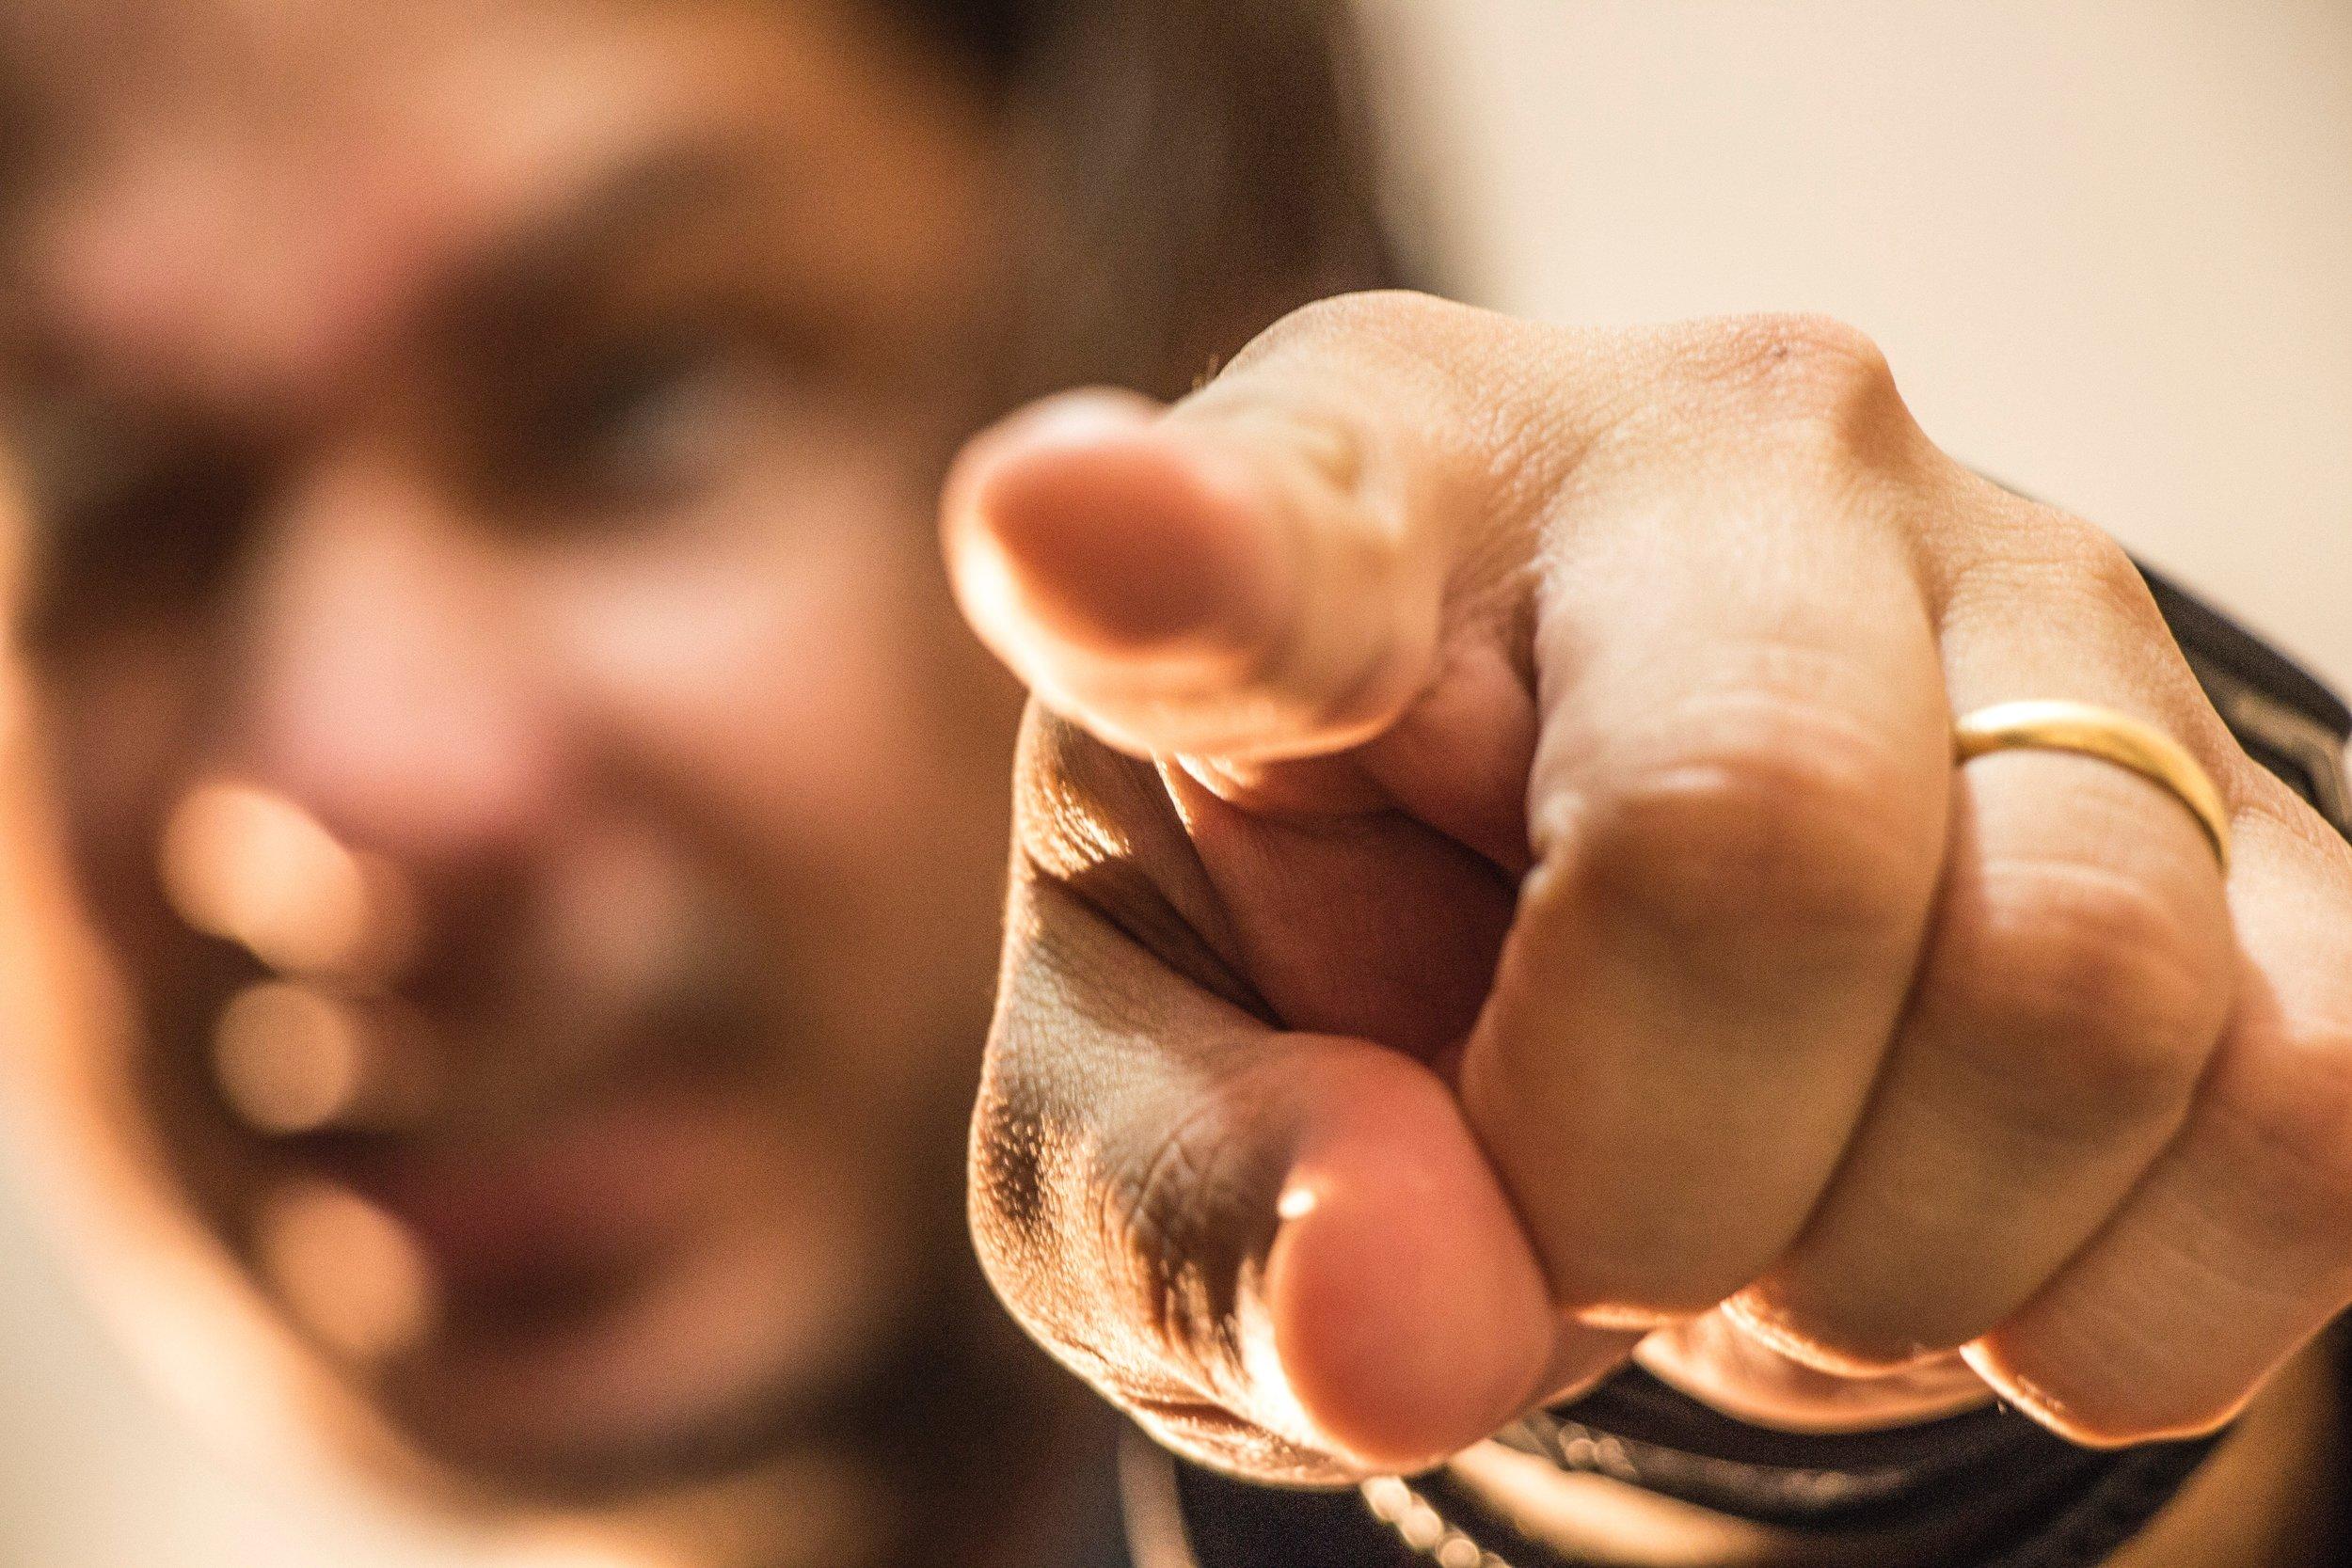 finger-gesturing-hand-1259327.jpg